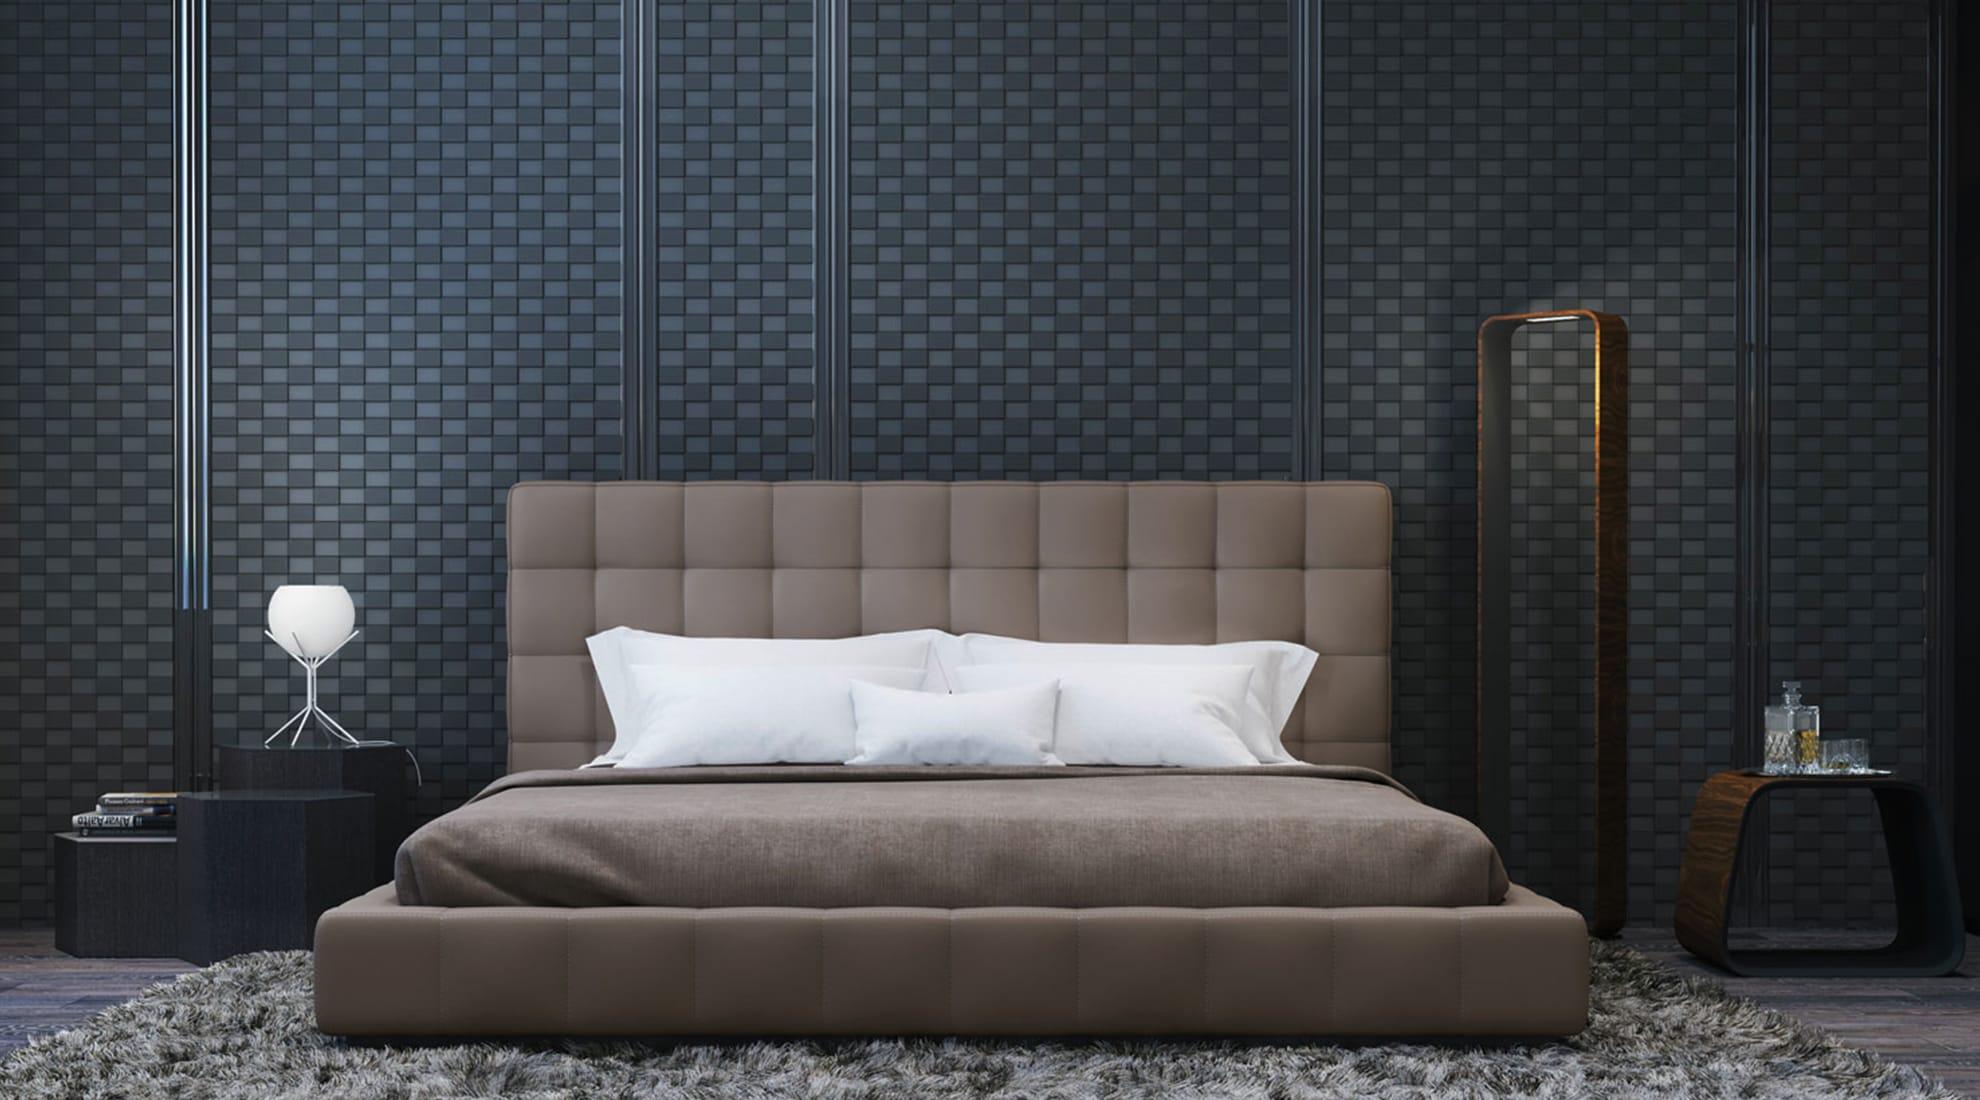 Thompson Bed by Modloft and Contour LED Floor Lamp by Pablo Designs